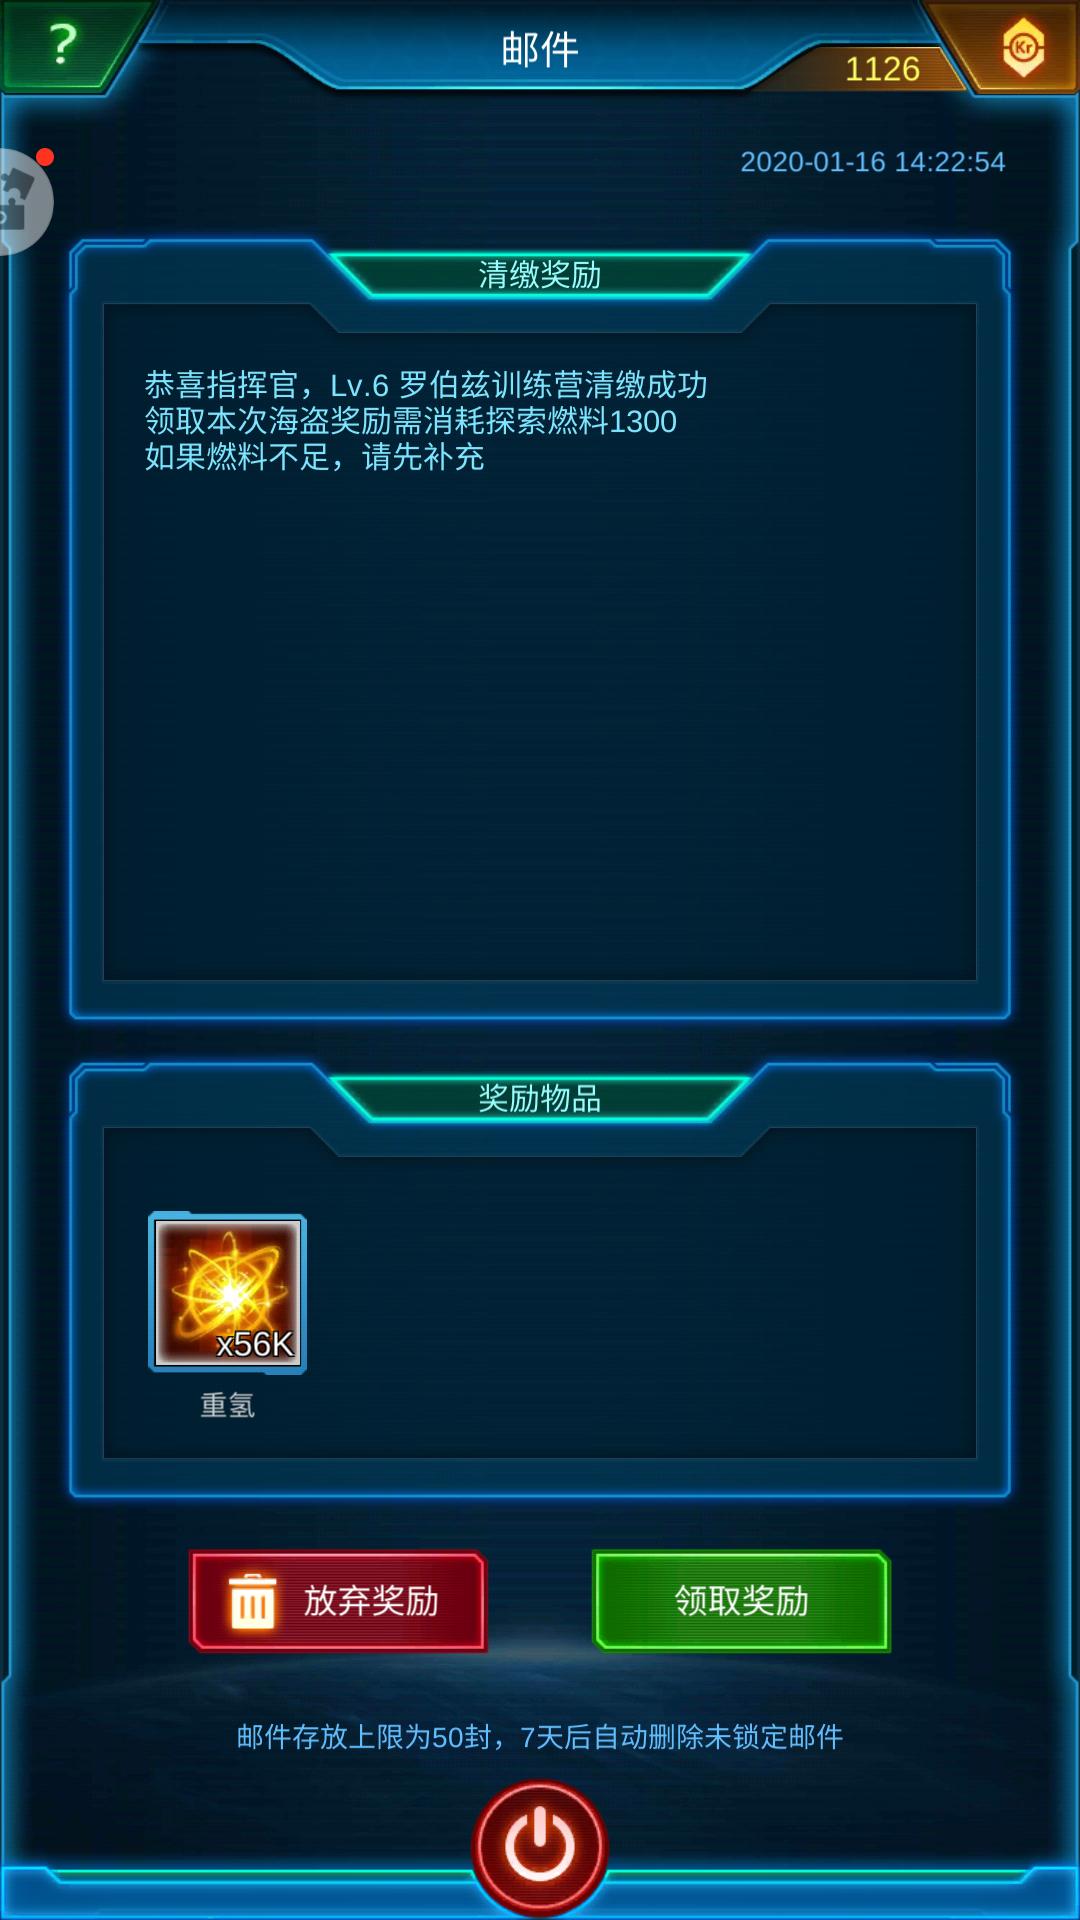 Screenshot_2020-01-16-14-29-00.png